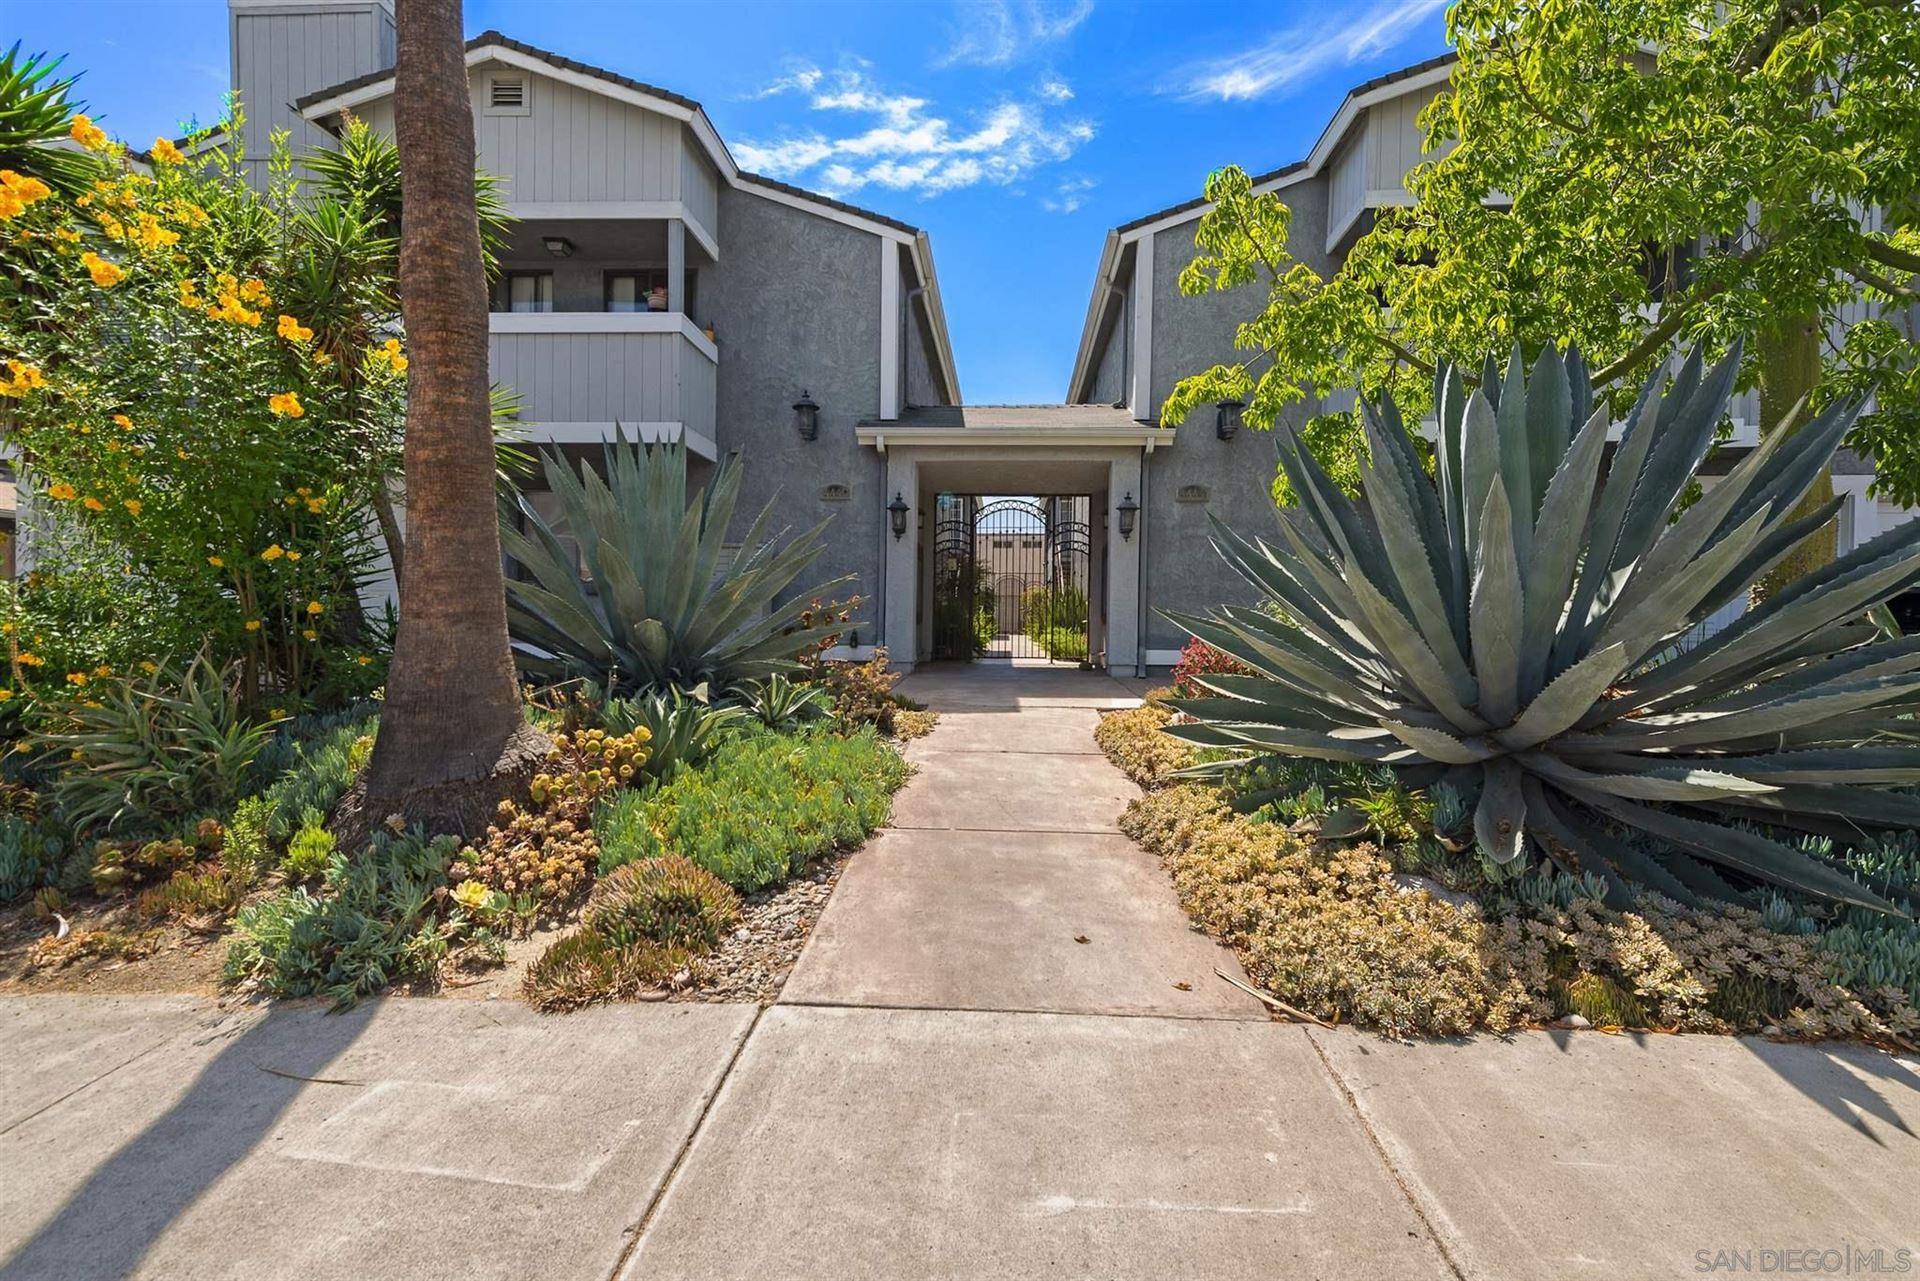 Photo of 4444 Cherokee Ave #7, San Diego, CA 92116 (MLS # 210021696)